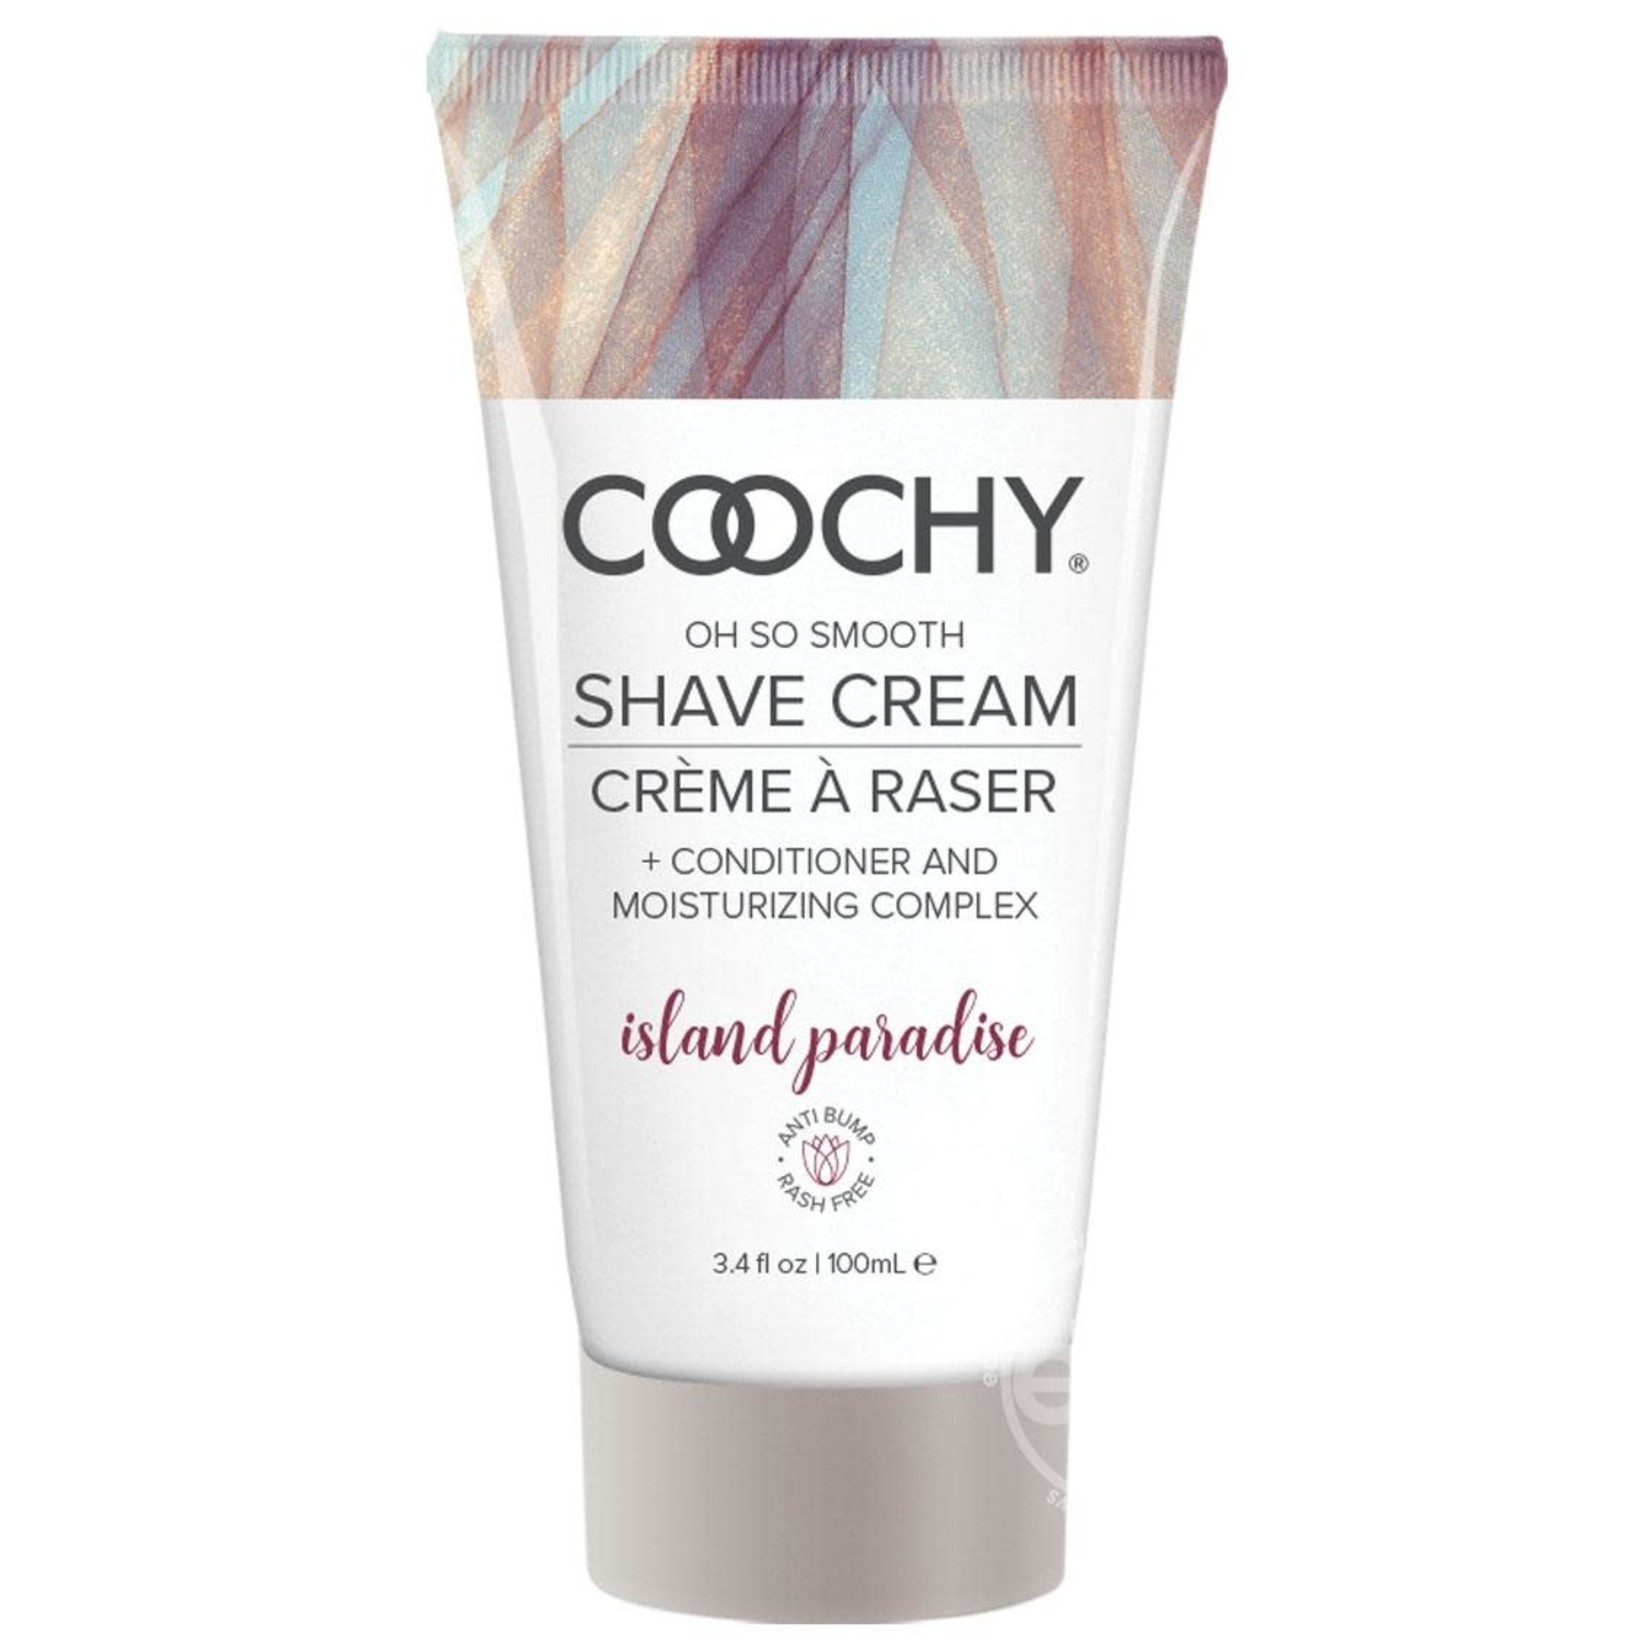 Coochy Shave Cream Island Paradise 3.4oz